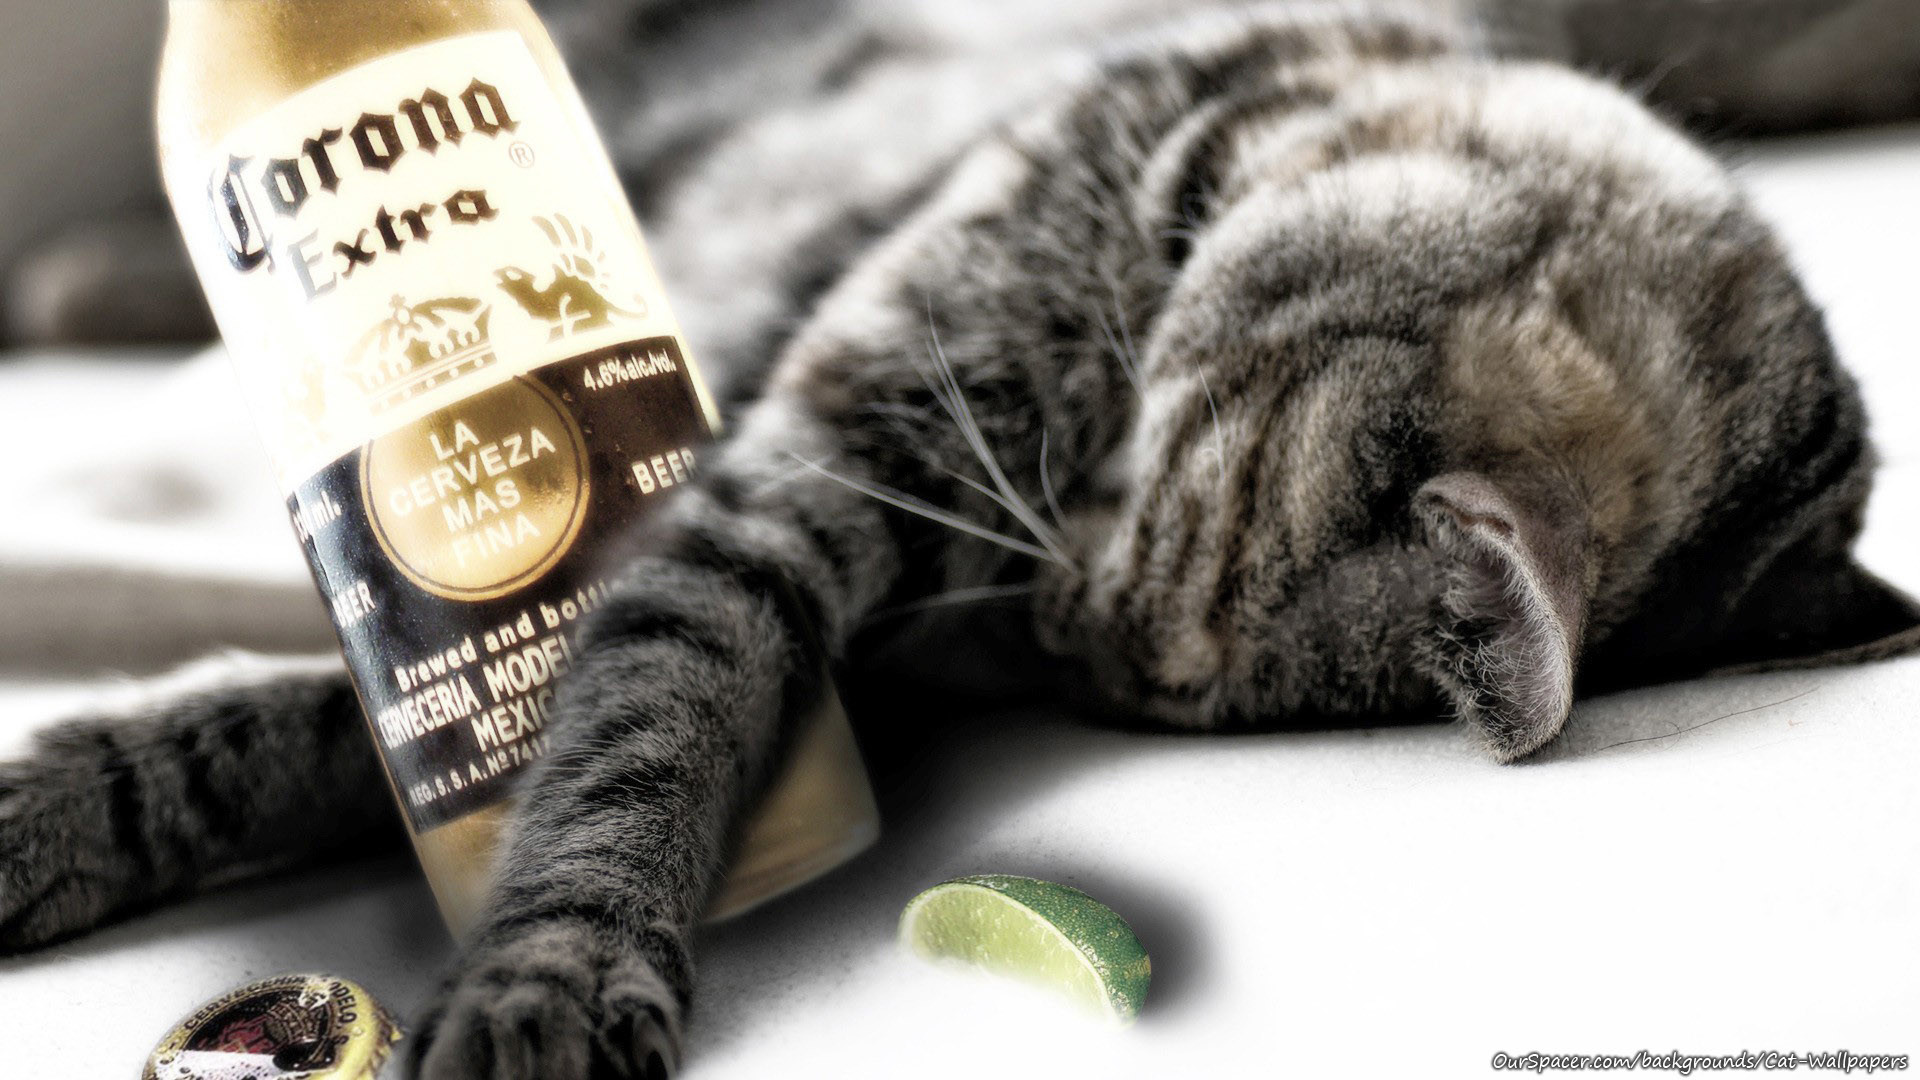 Cat drank too many Coronas wallpapers for myspace, twitter, and hi5  backgrounds. Cat drank too many Coronas wallpaper